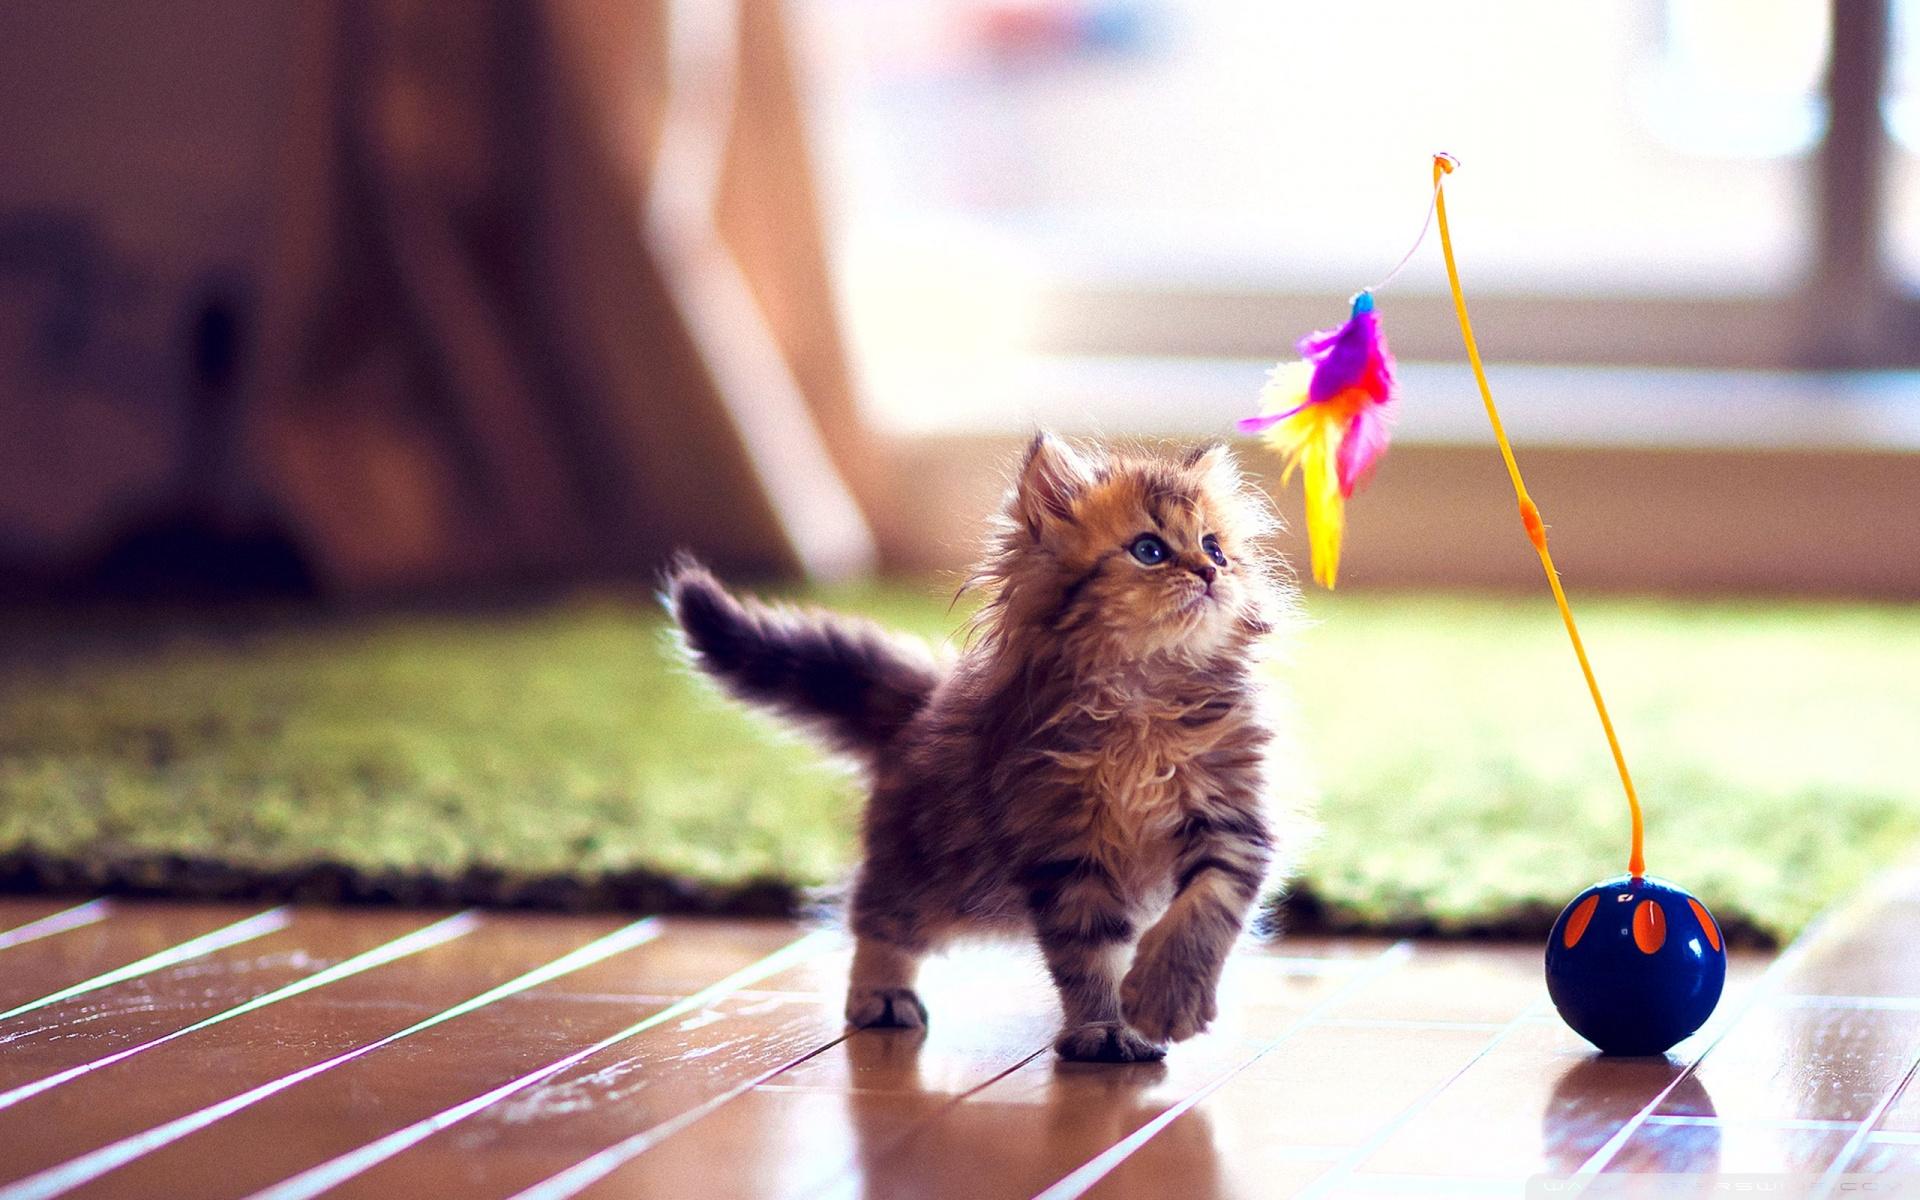 10 Top Cute Wild Animal Wallpaper Full Hd 1080p For Pc: 电脑桌面壁纸可爱萌宠_电脑桌面壁纸可爱萌宠画法